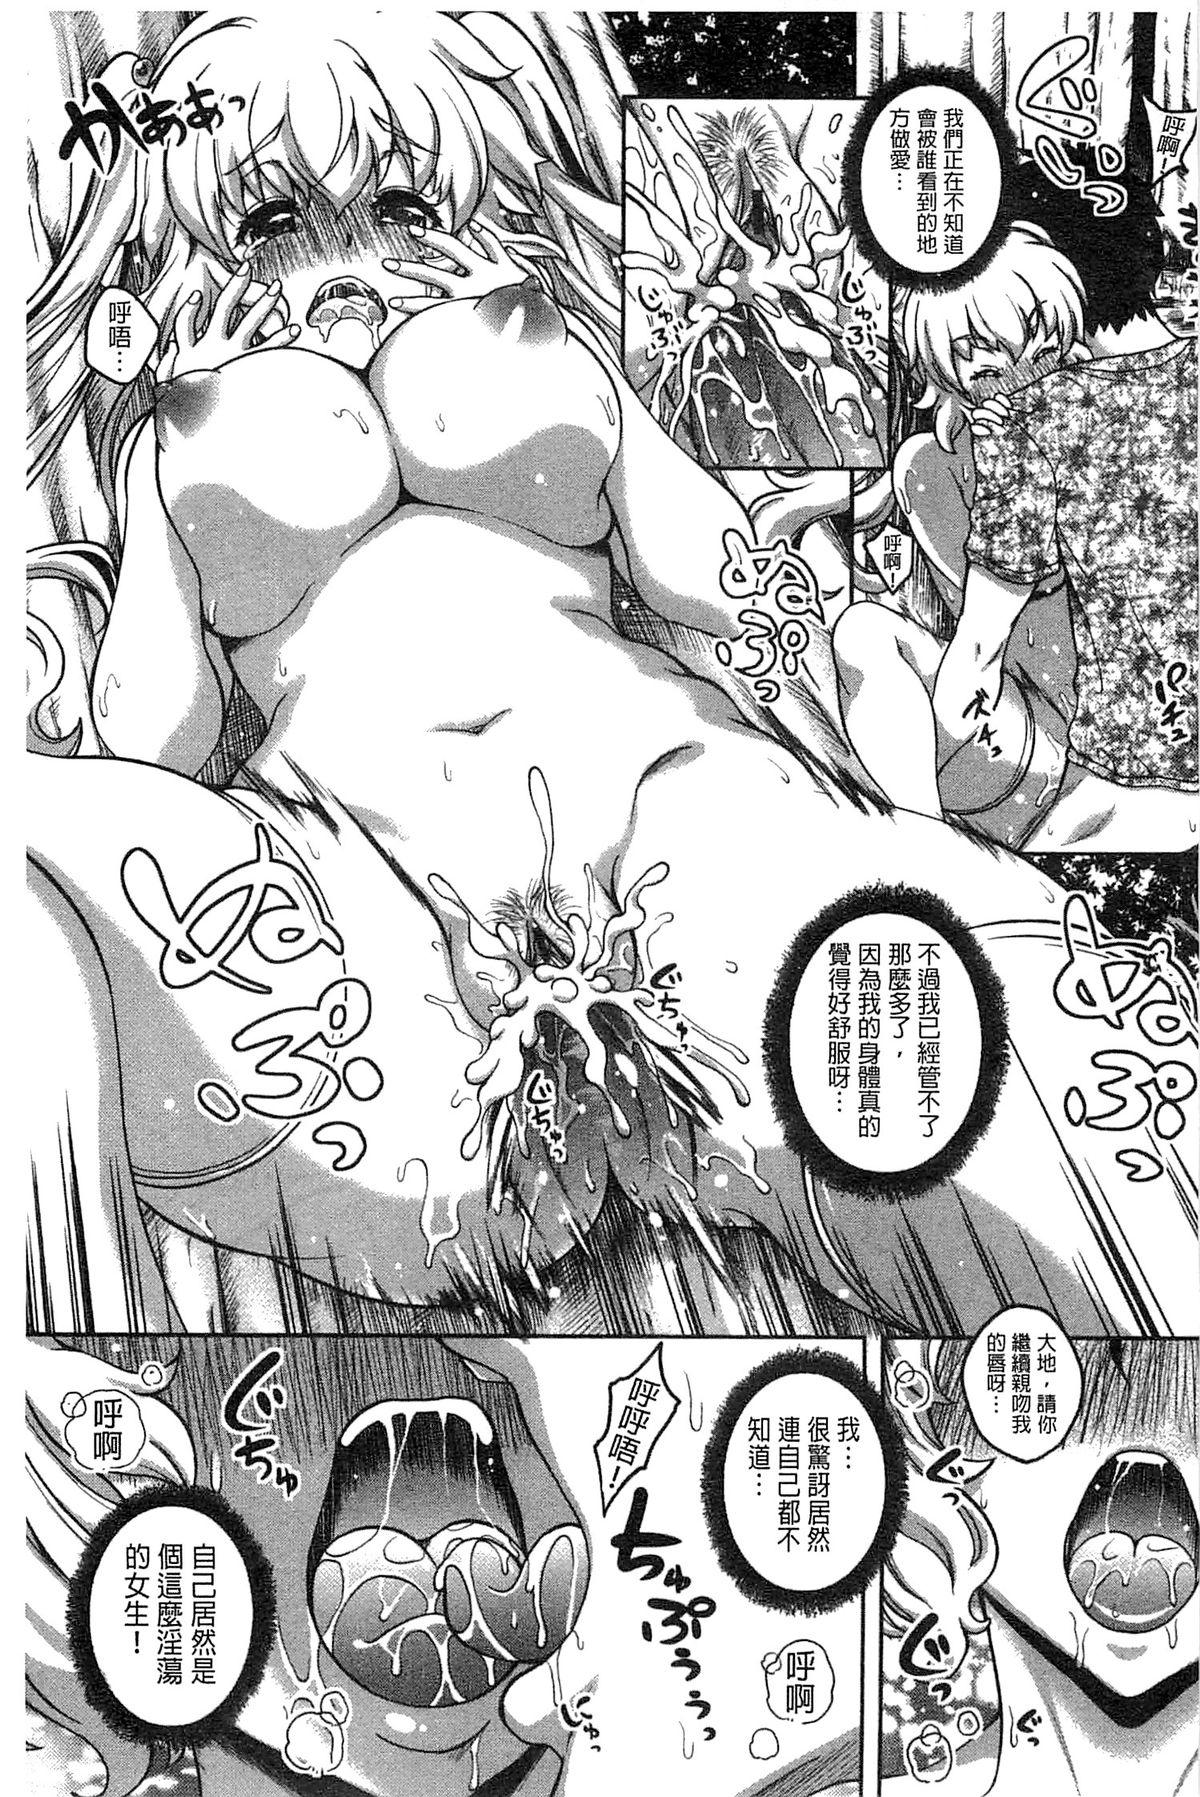 Hajimete nan dakara - First sexual experience 163